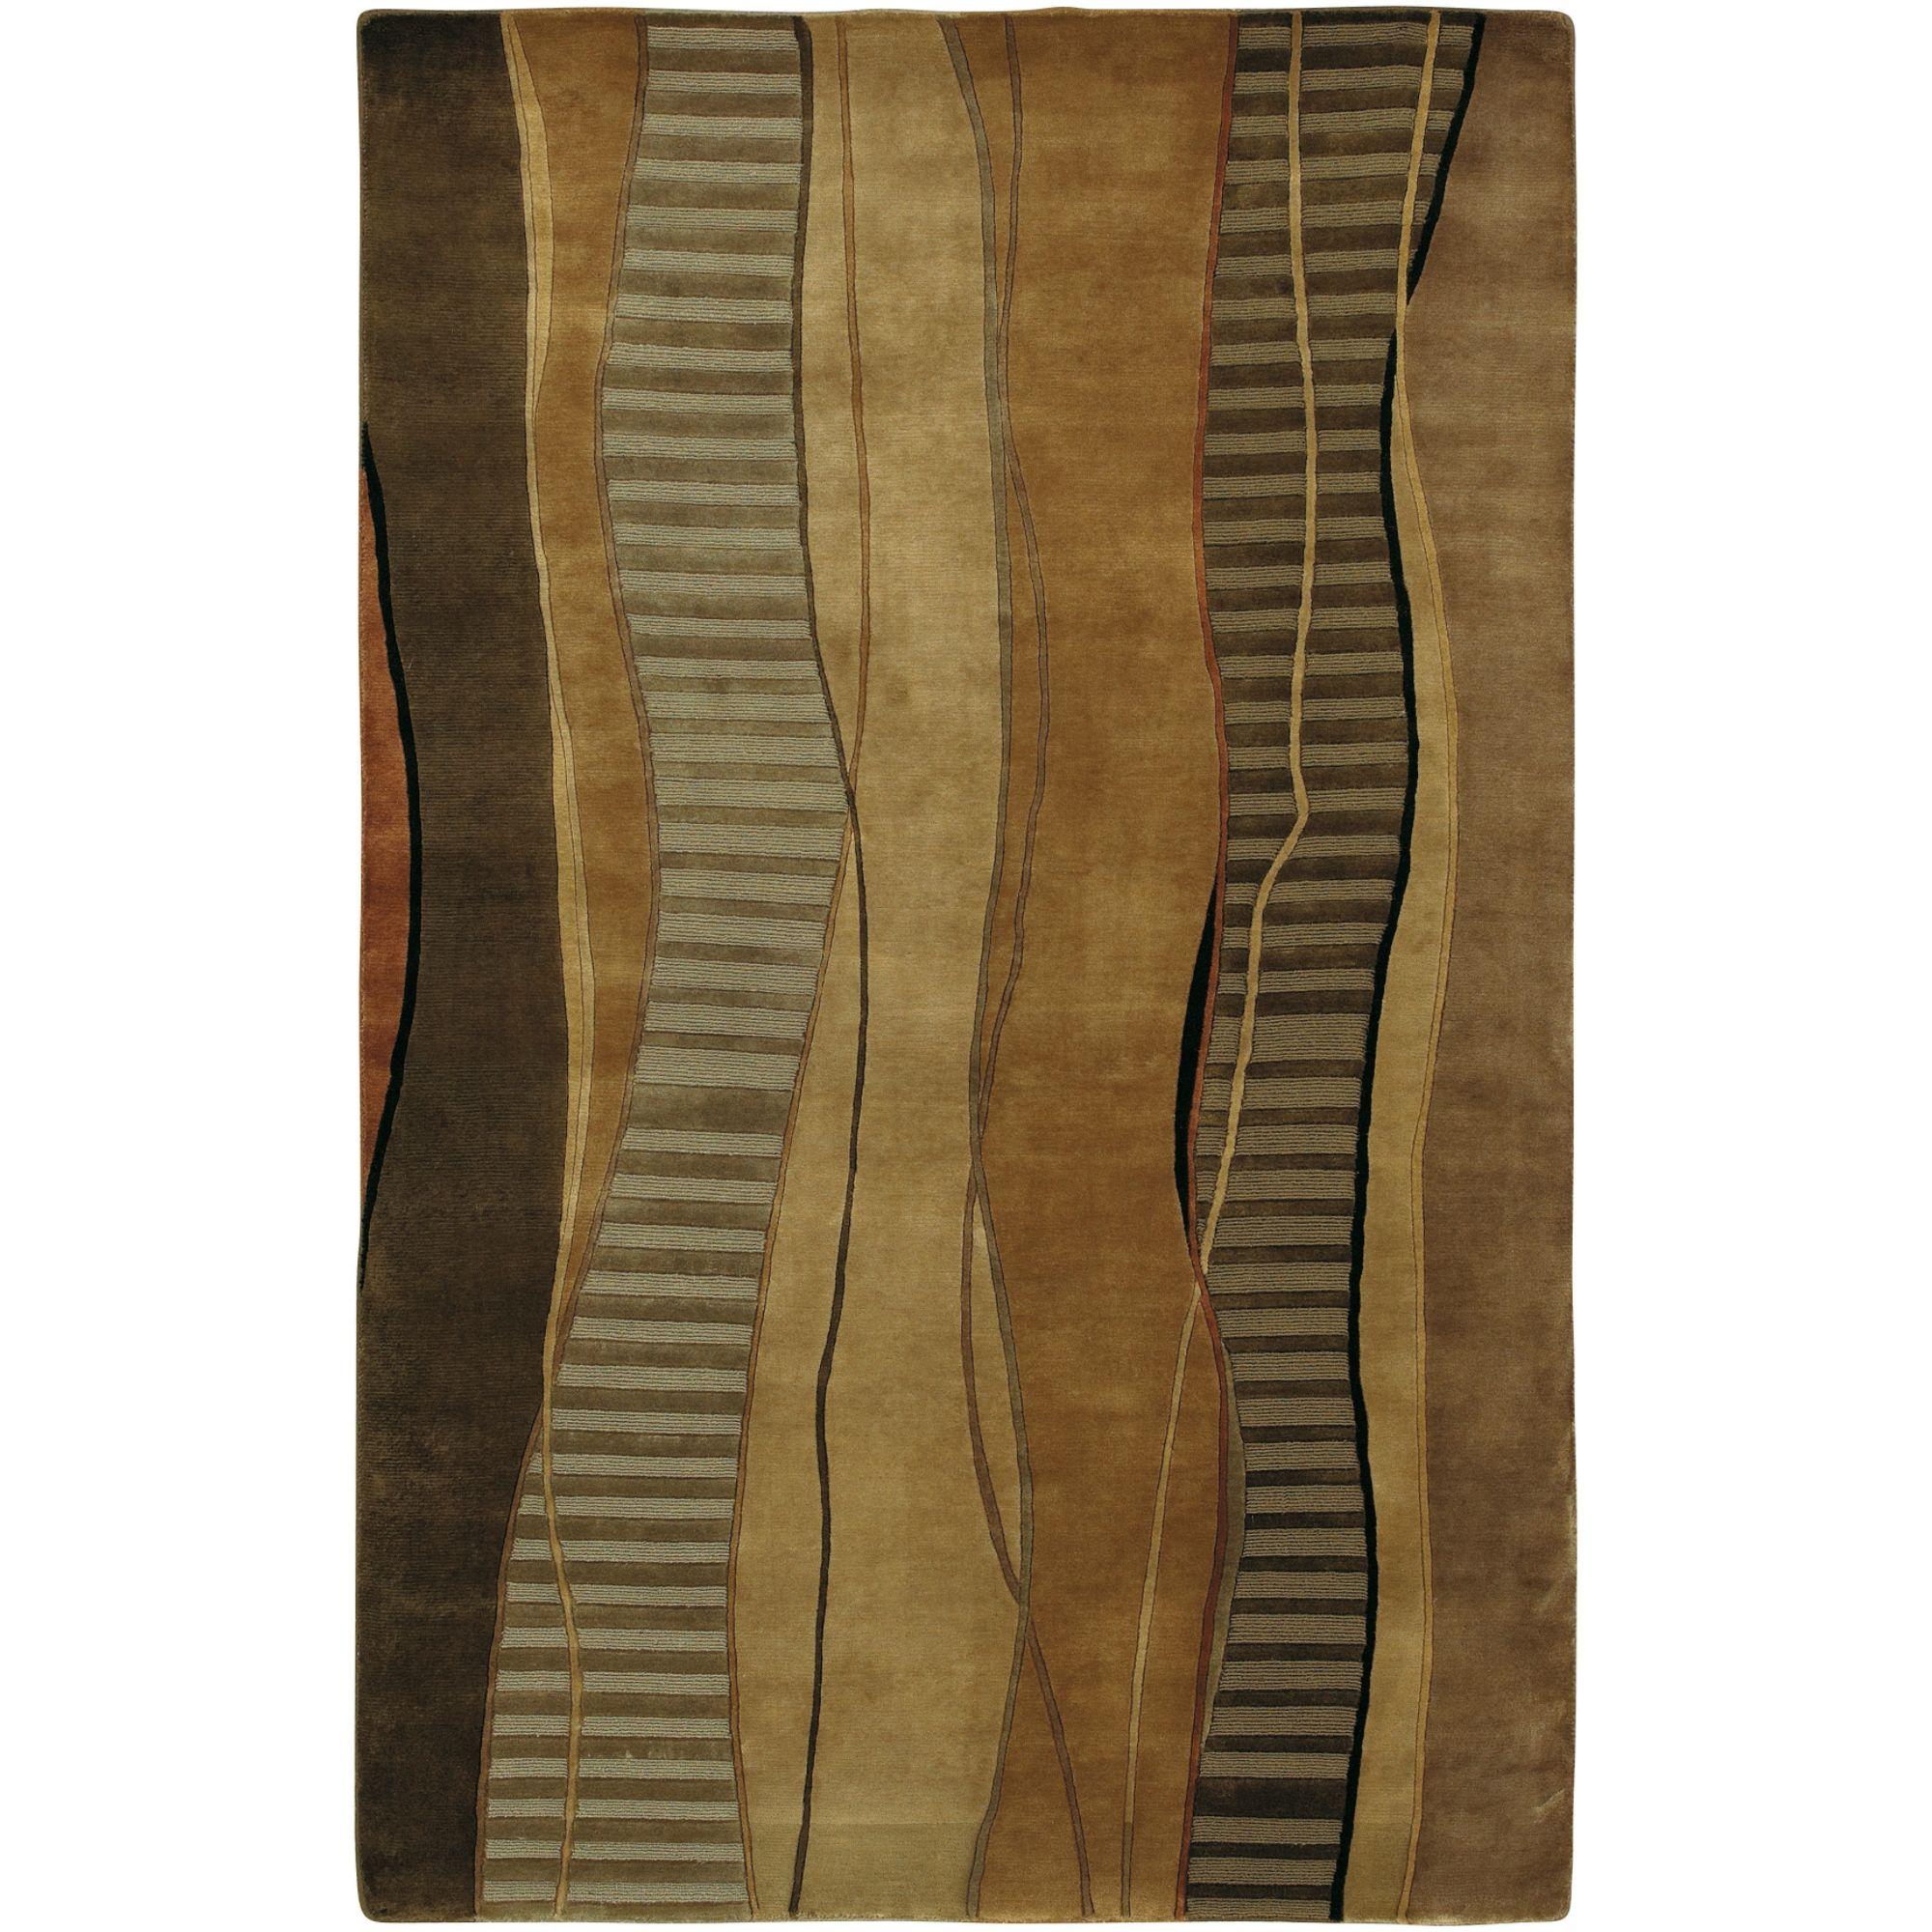 2ft. x 3ft. Mugal Decorative Rug